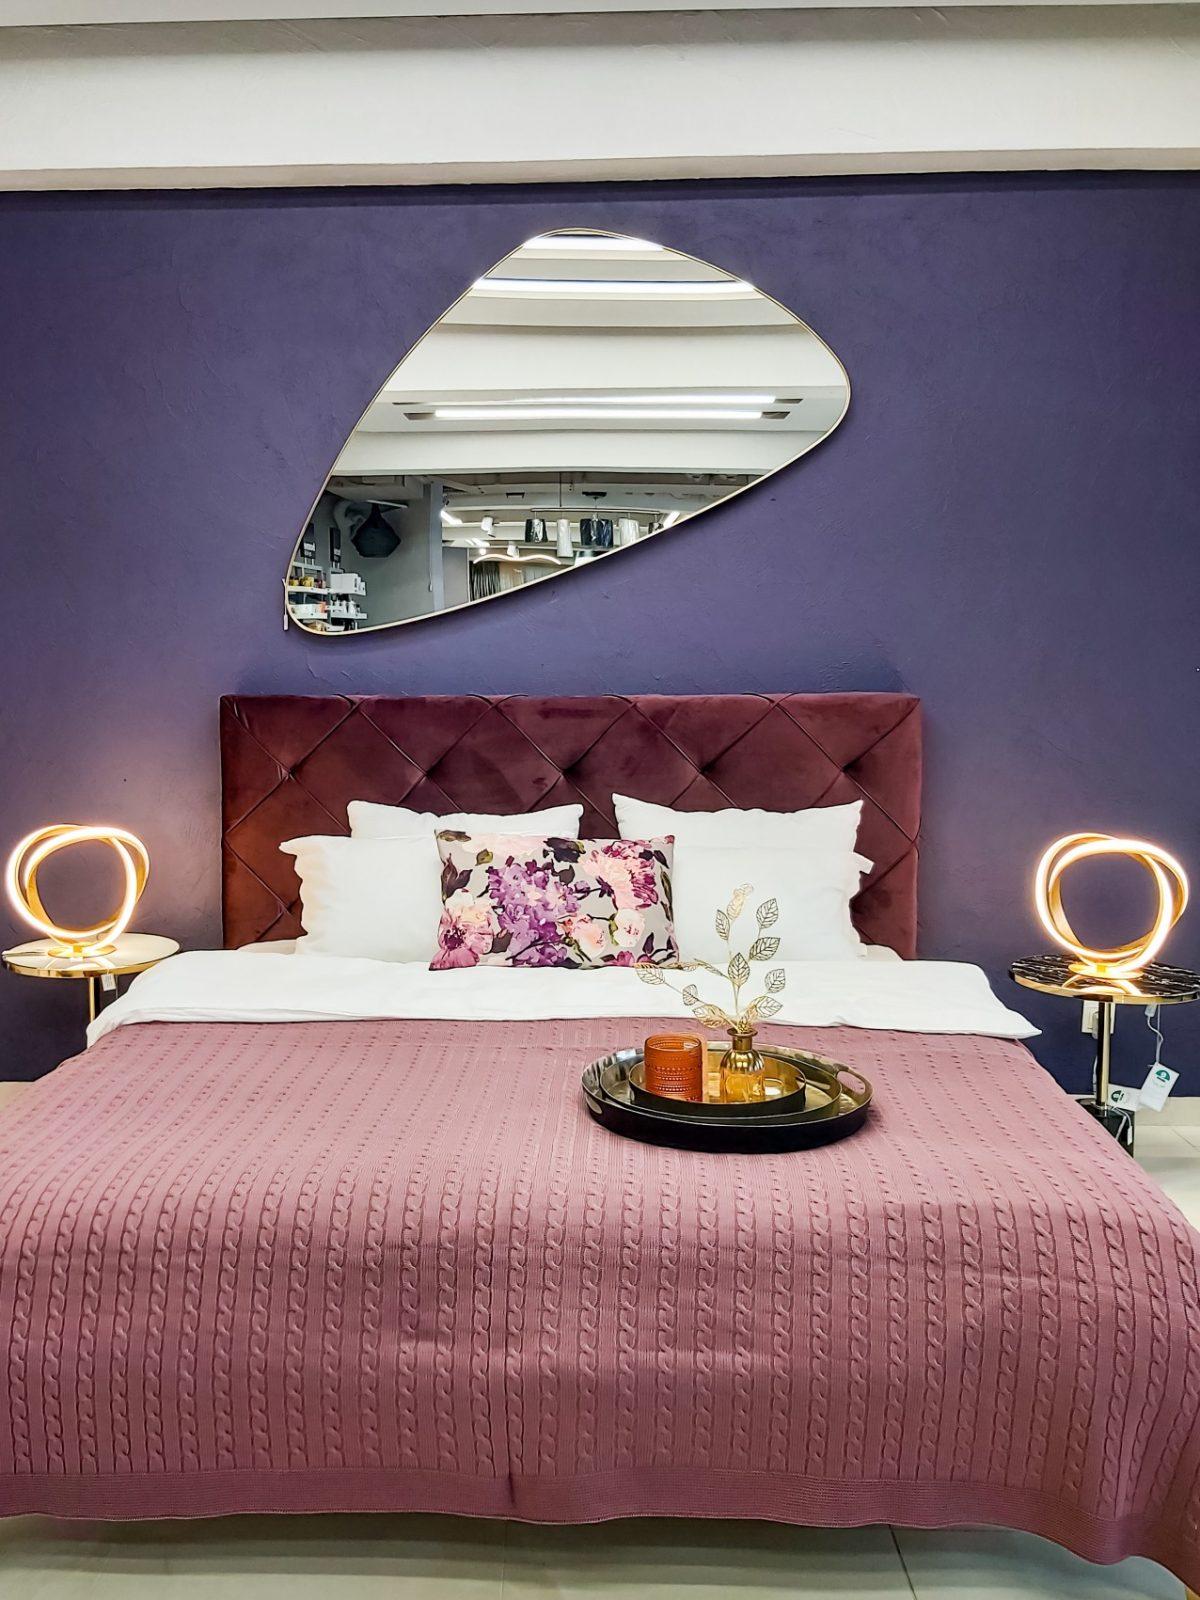 resized image Promo 1200x1600 - Dormitor Sixty 3C Candy Polstermoebel